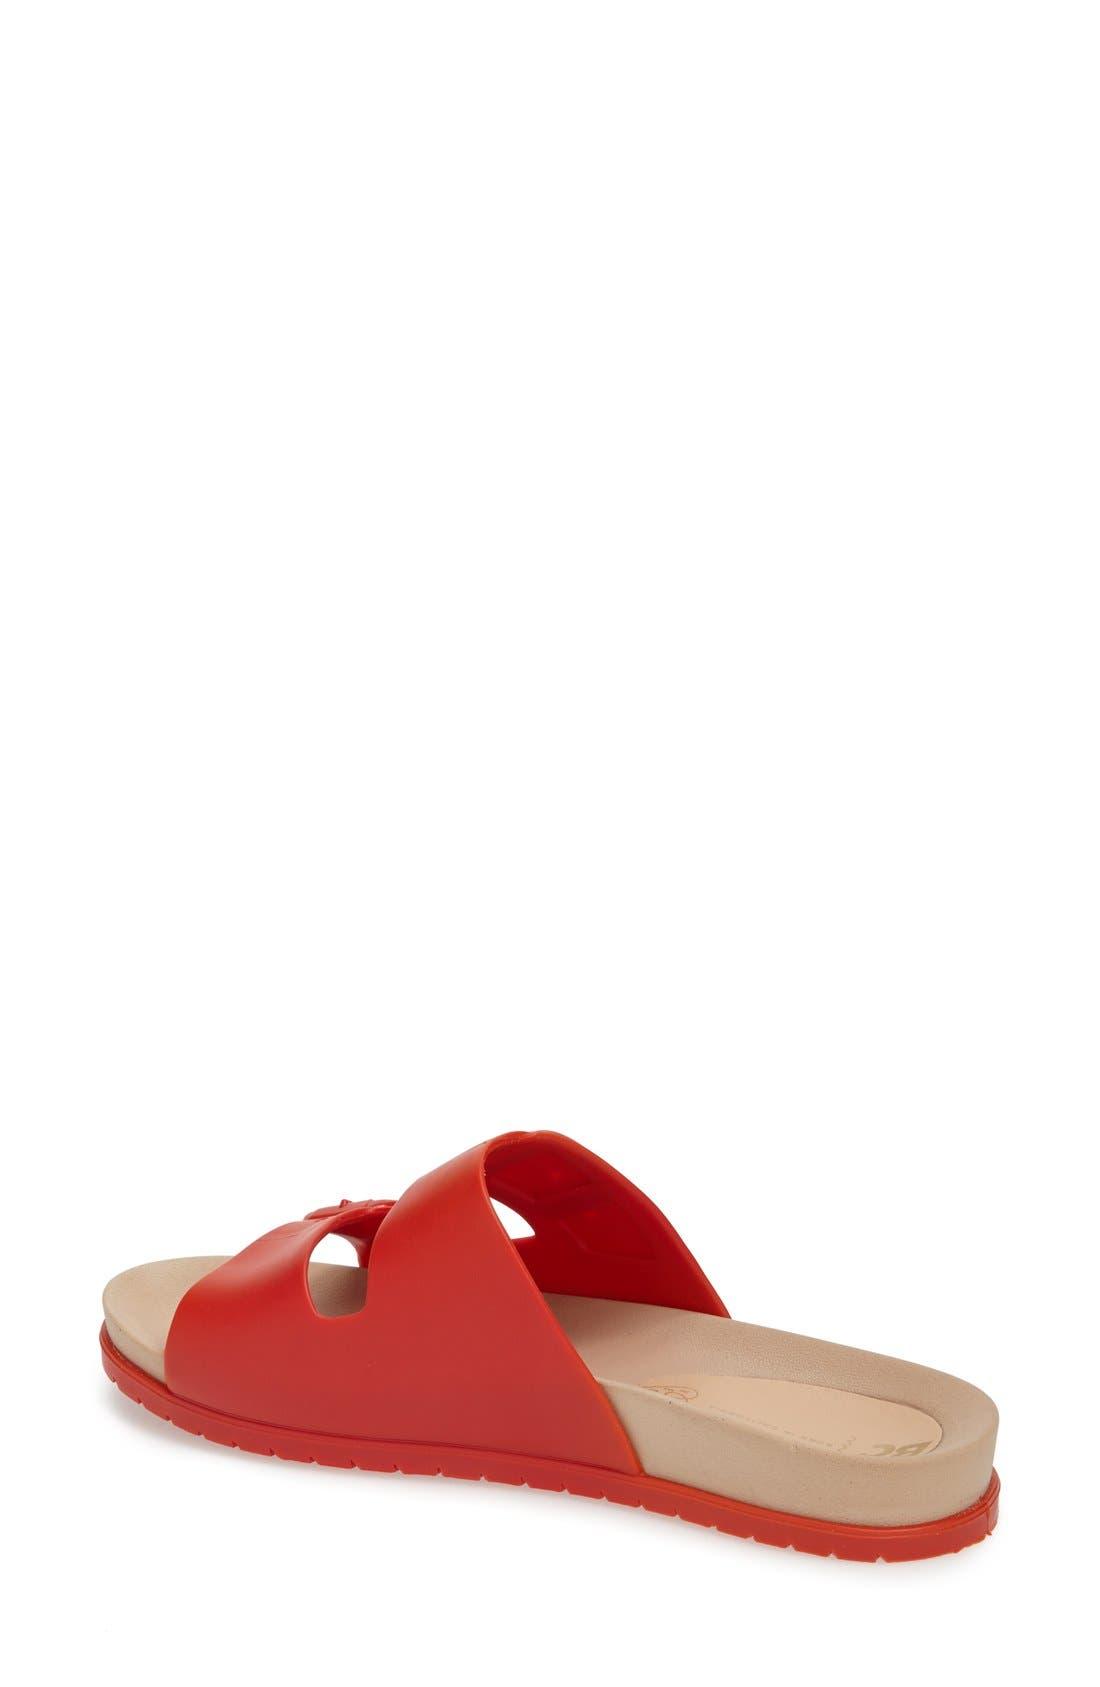 Alternate Image 2  - BC Footwear 'Dim The Lights' Slide Sandal (Women)